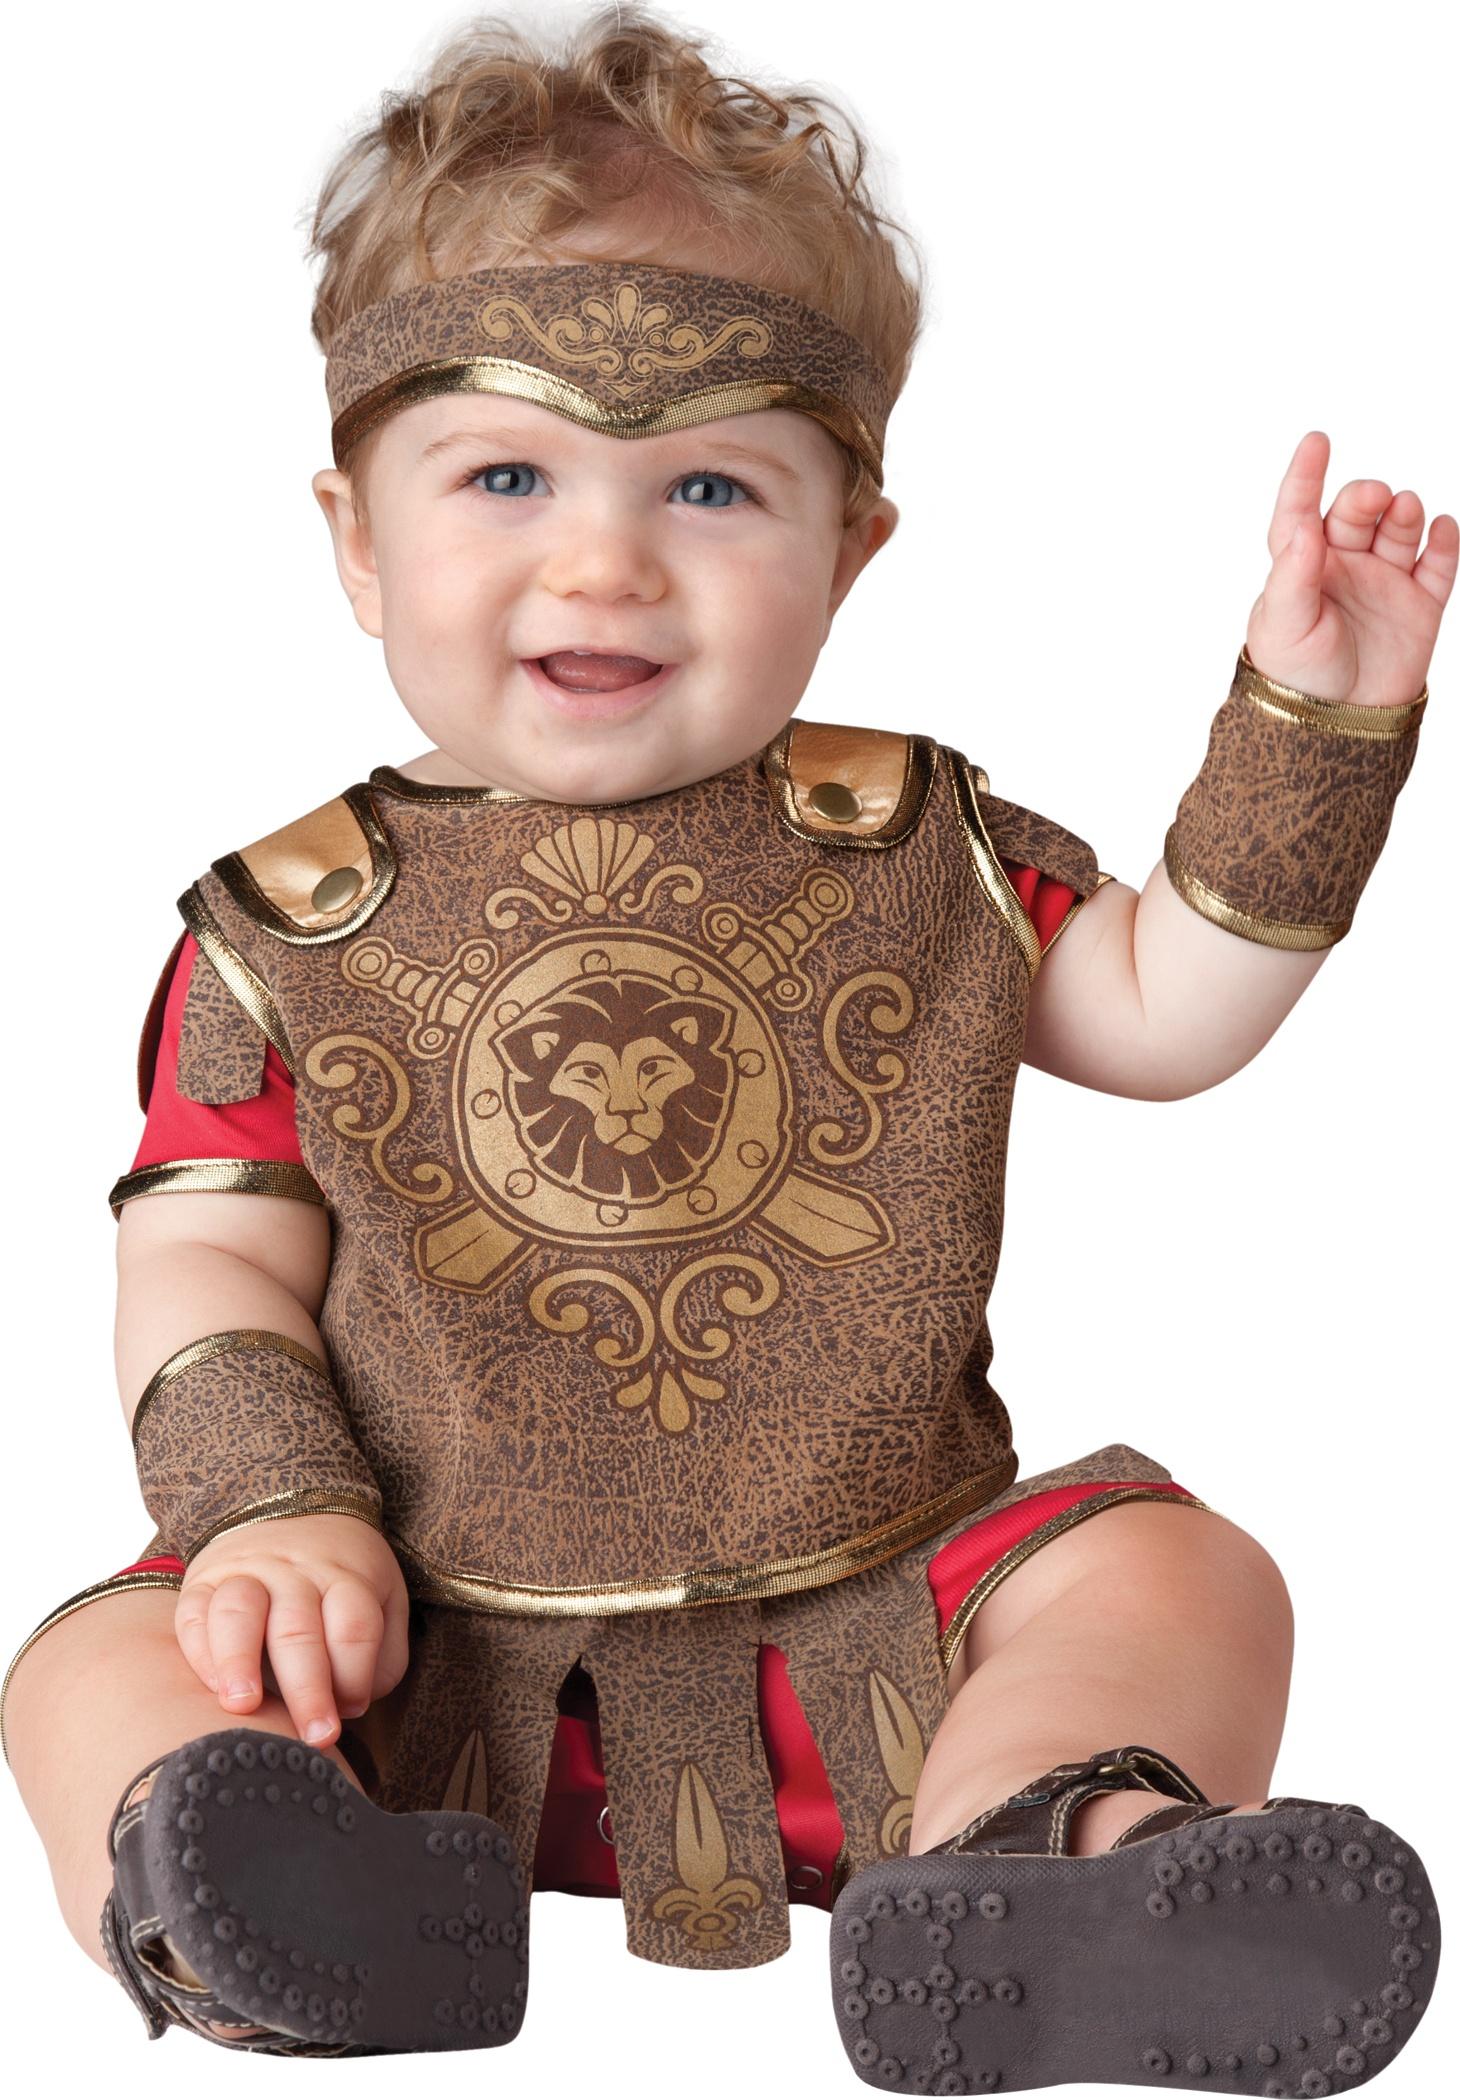 Giddy gladiator baby costume mr costumes - Disfraz para bebes ...